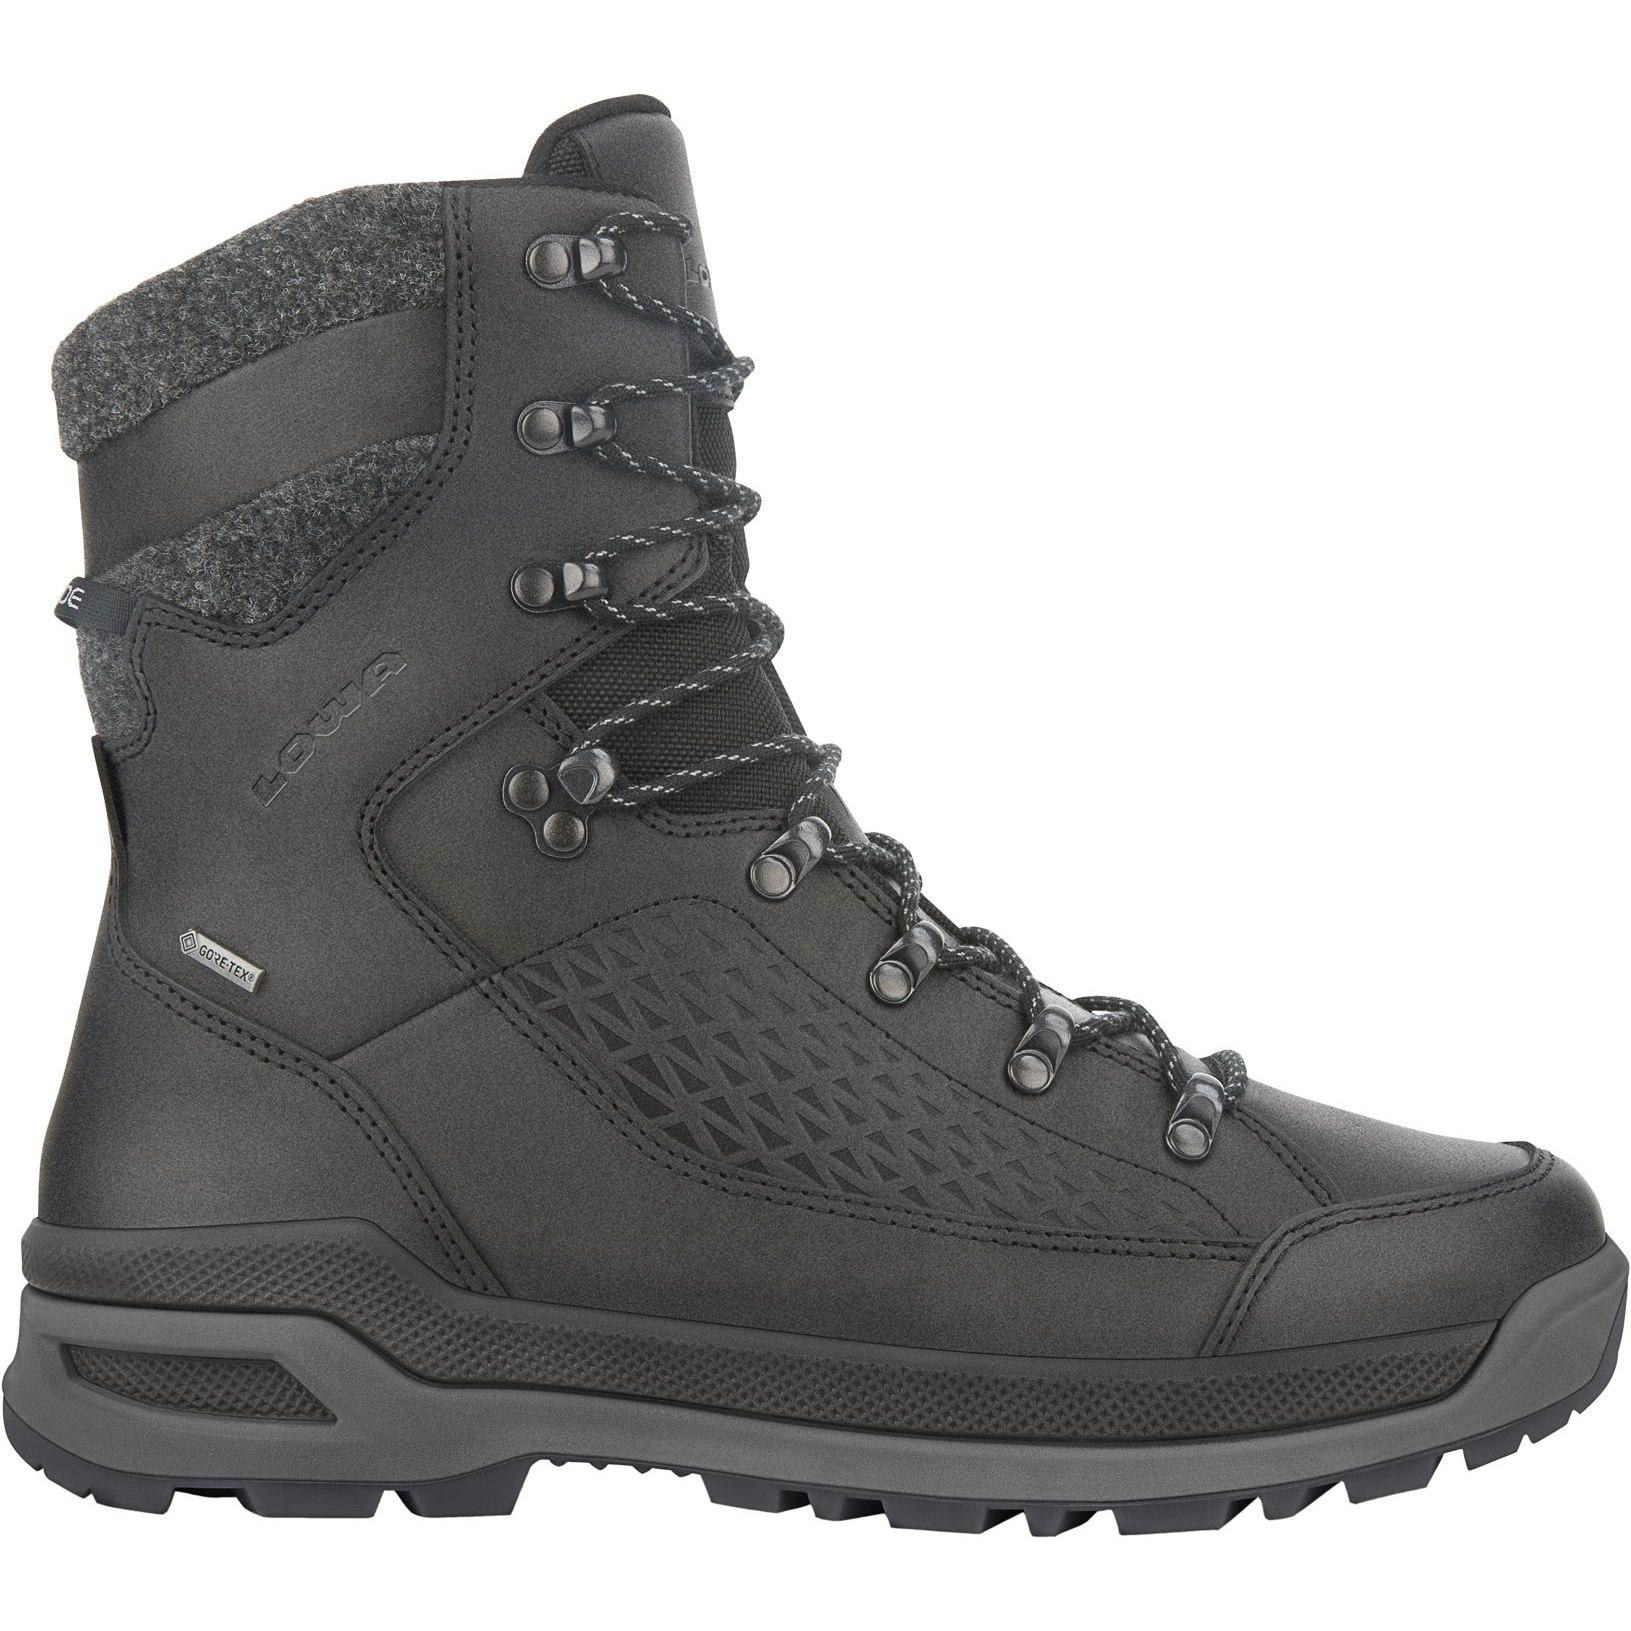 LOWA Renegade EVO Ice GTX Winter Shoe - black